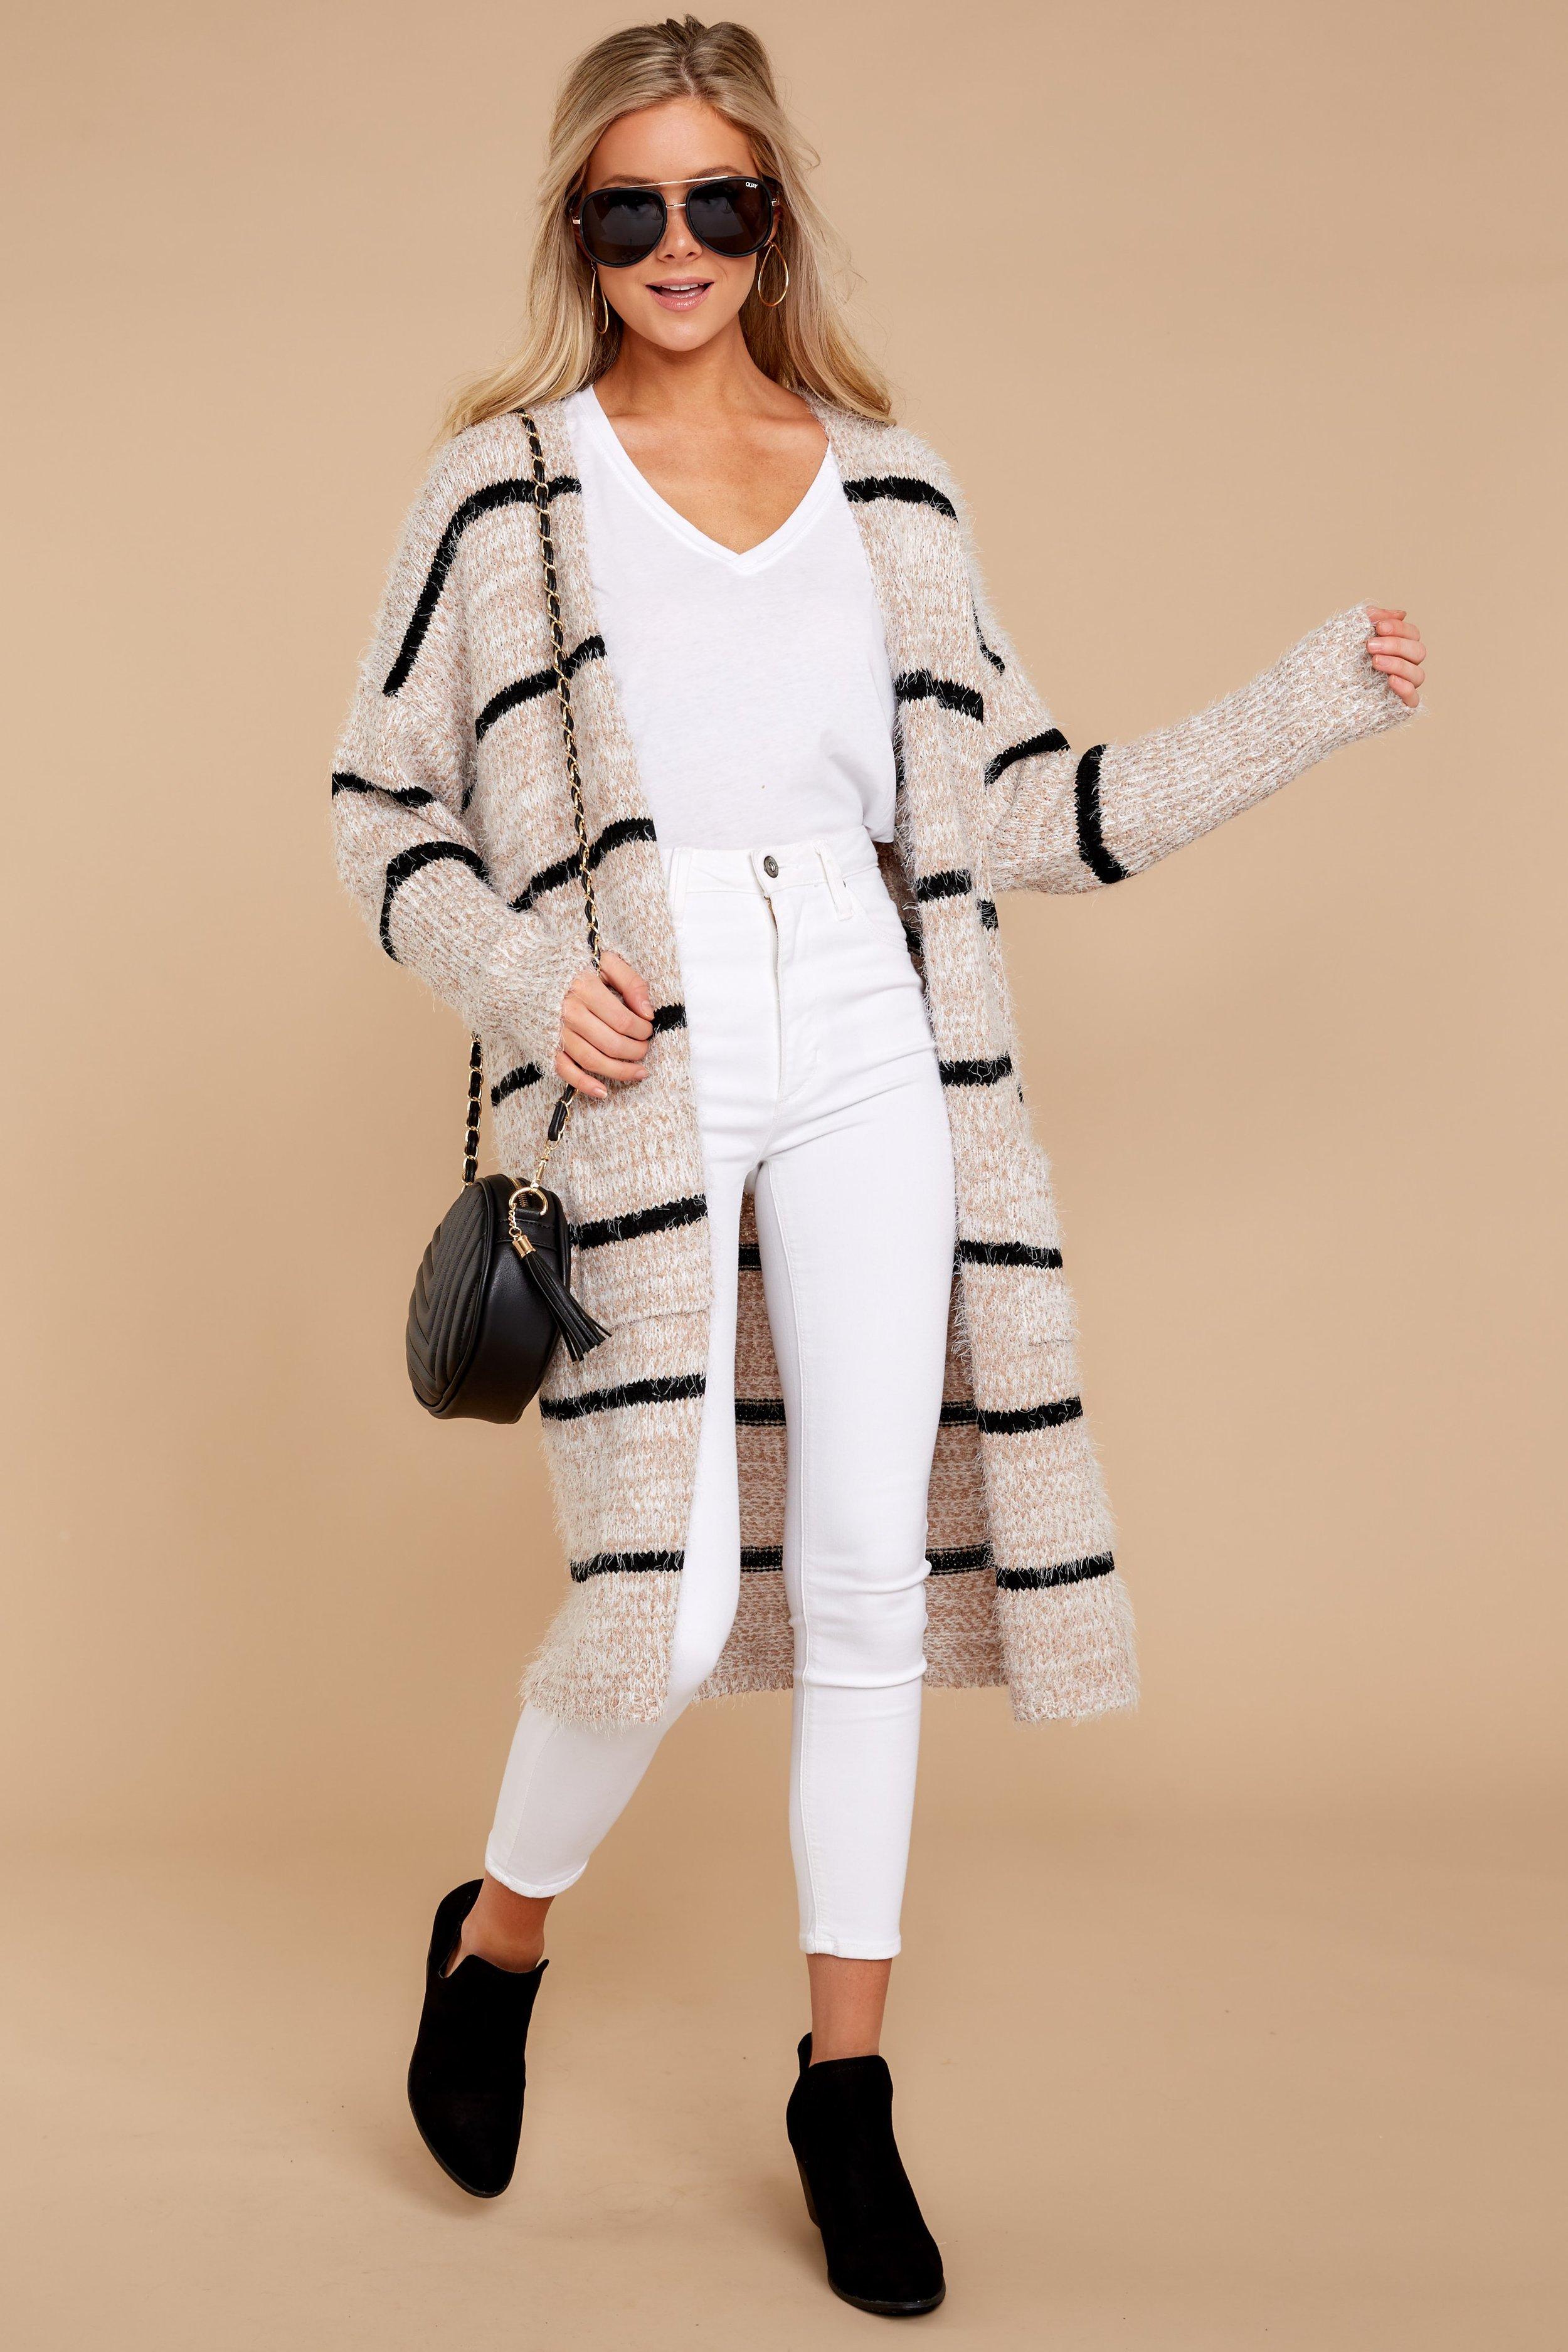 black and tan striped cardigan